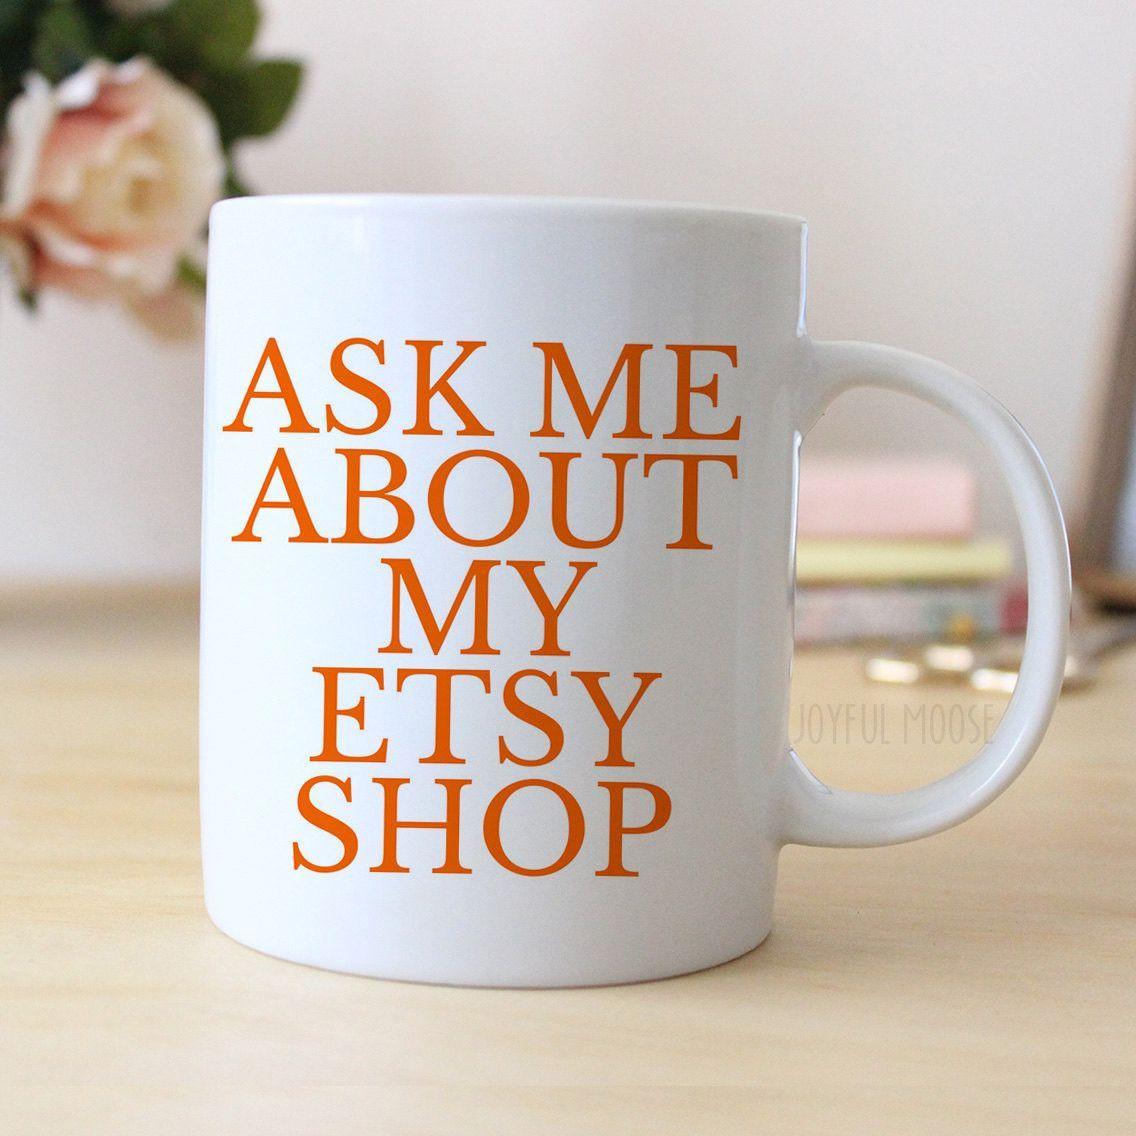 Etsy Coffee Mug Etsy Seller Gift Etsy coffee, Mugs, Etsy